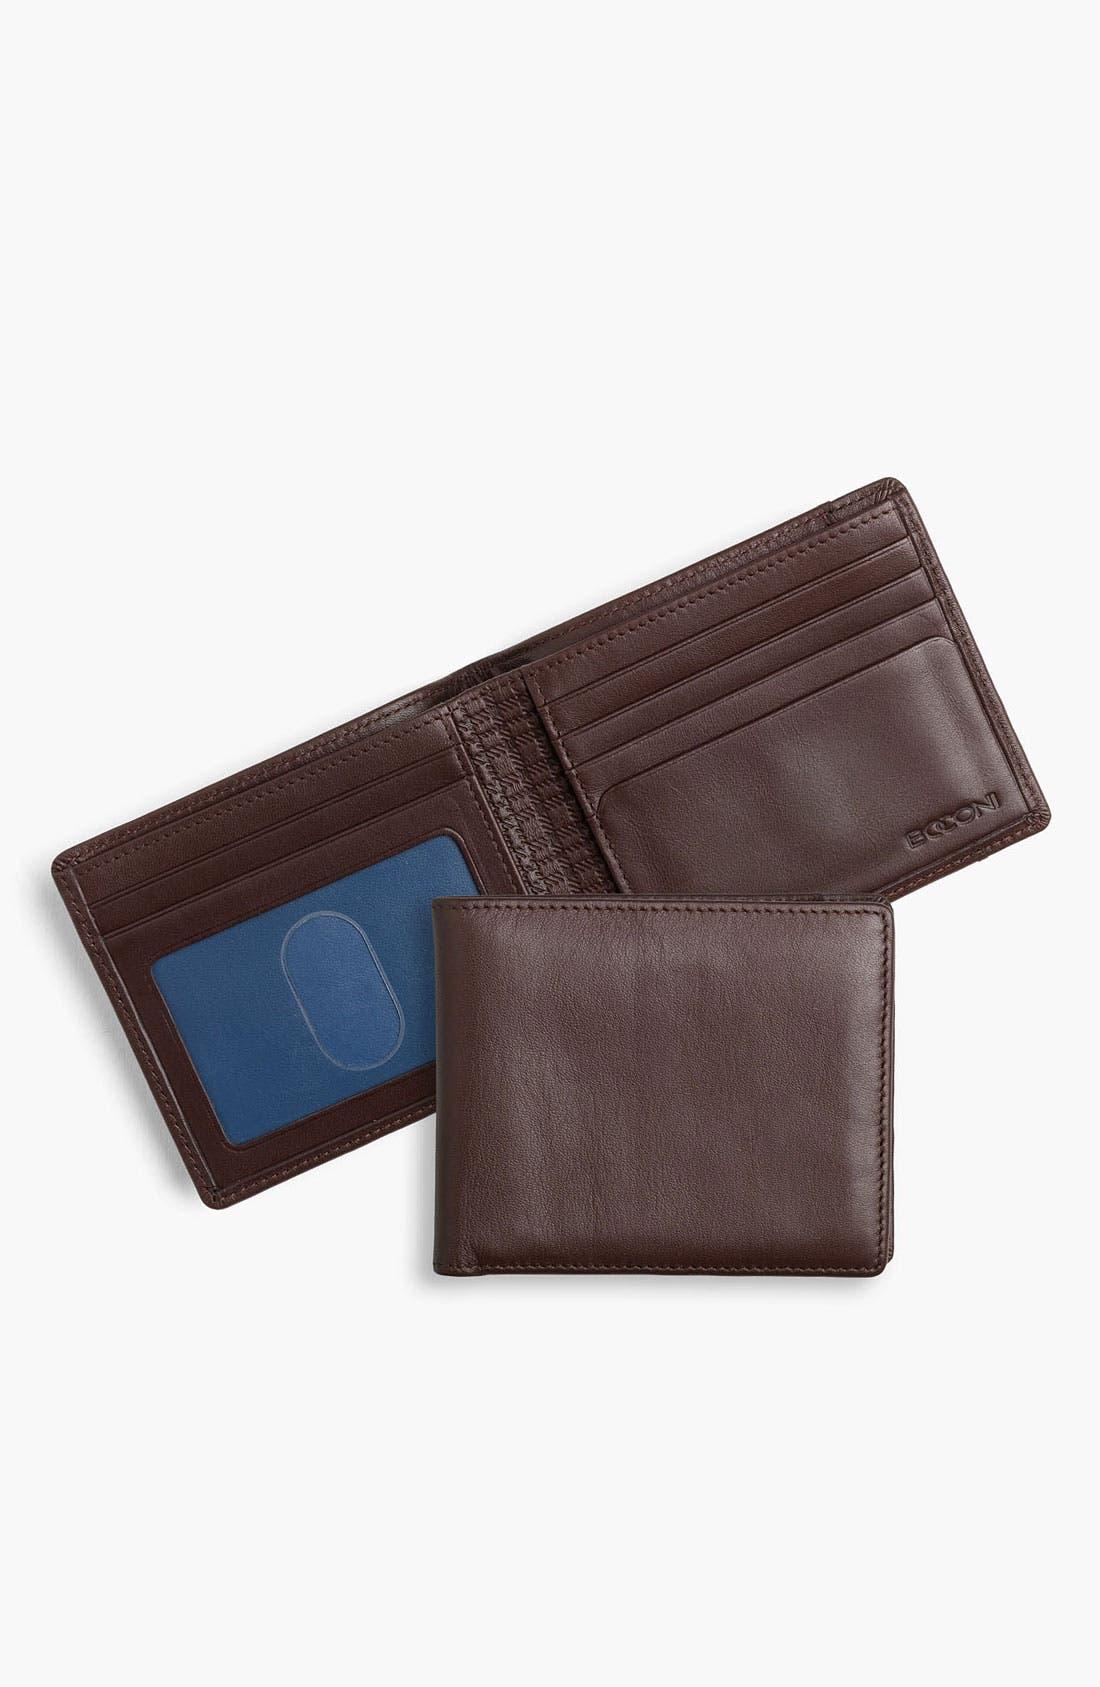 Main Image - Boconi Calfskin Wallet